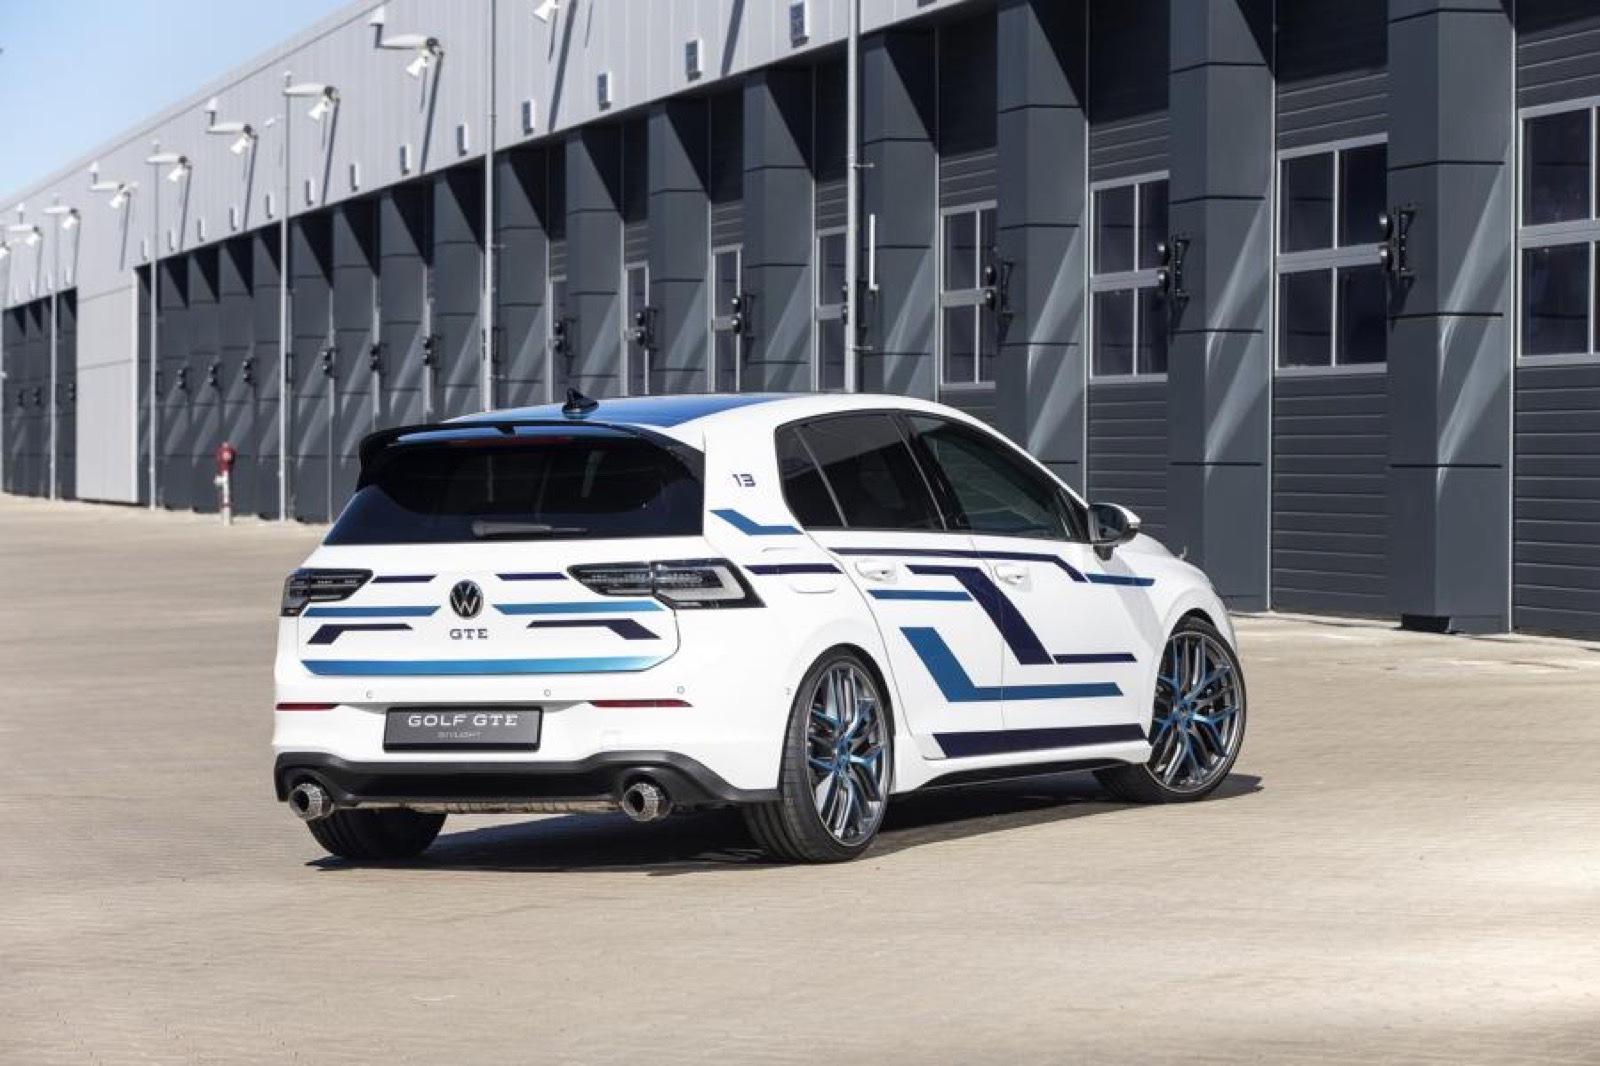 Volkswagen_Golf_GTE_Skylight-0007